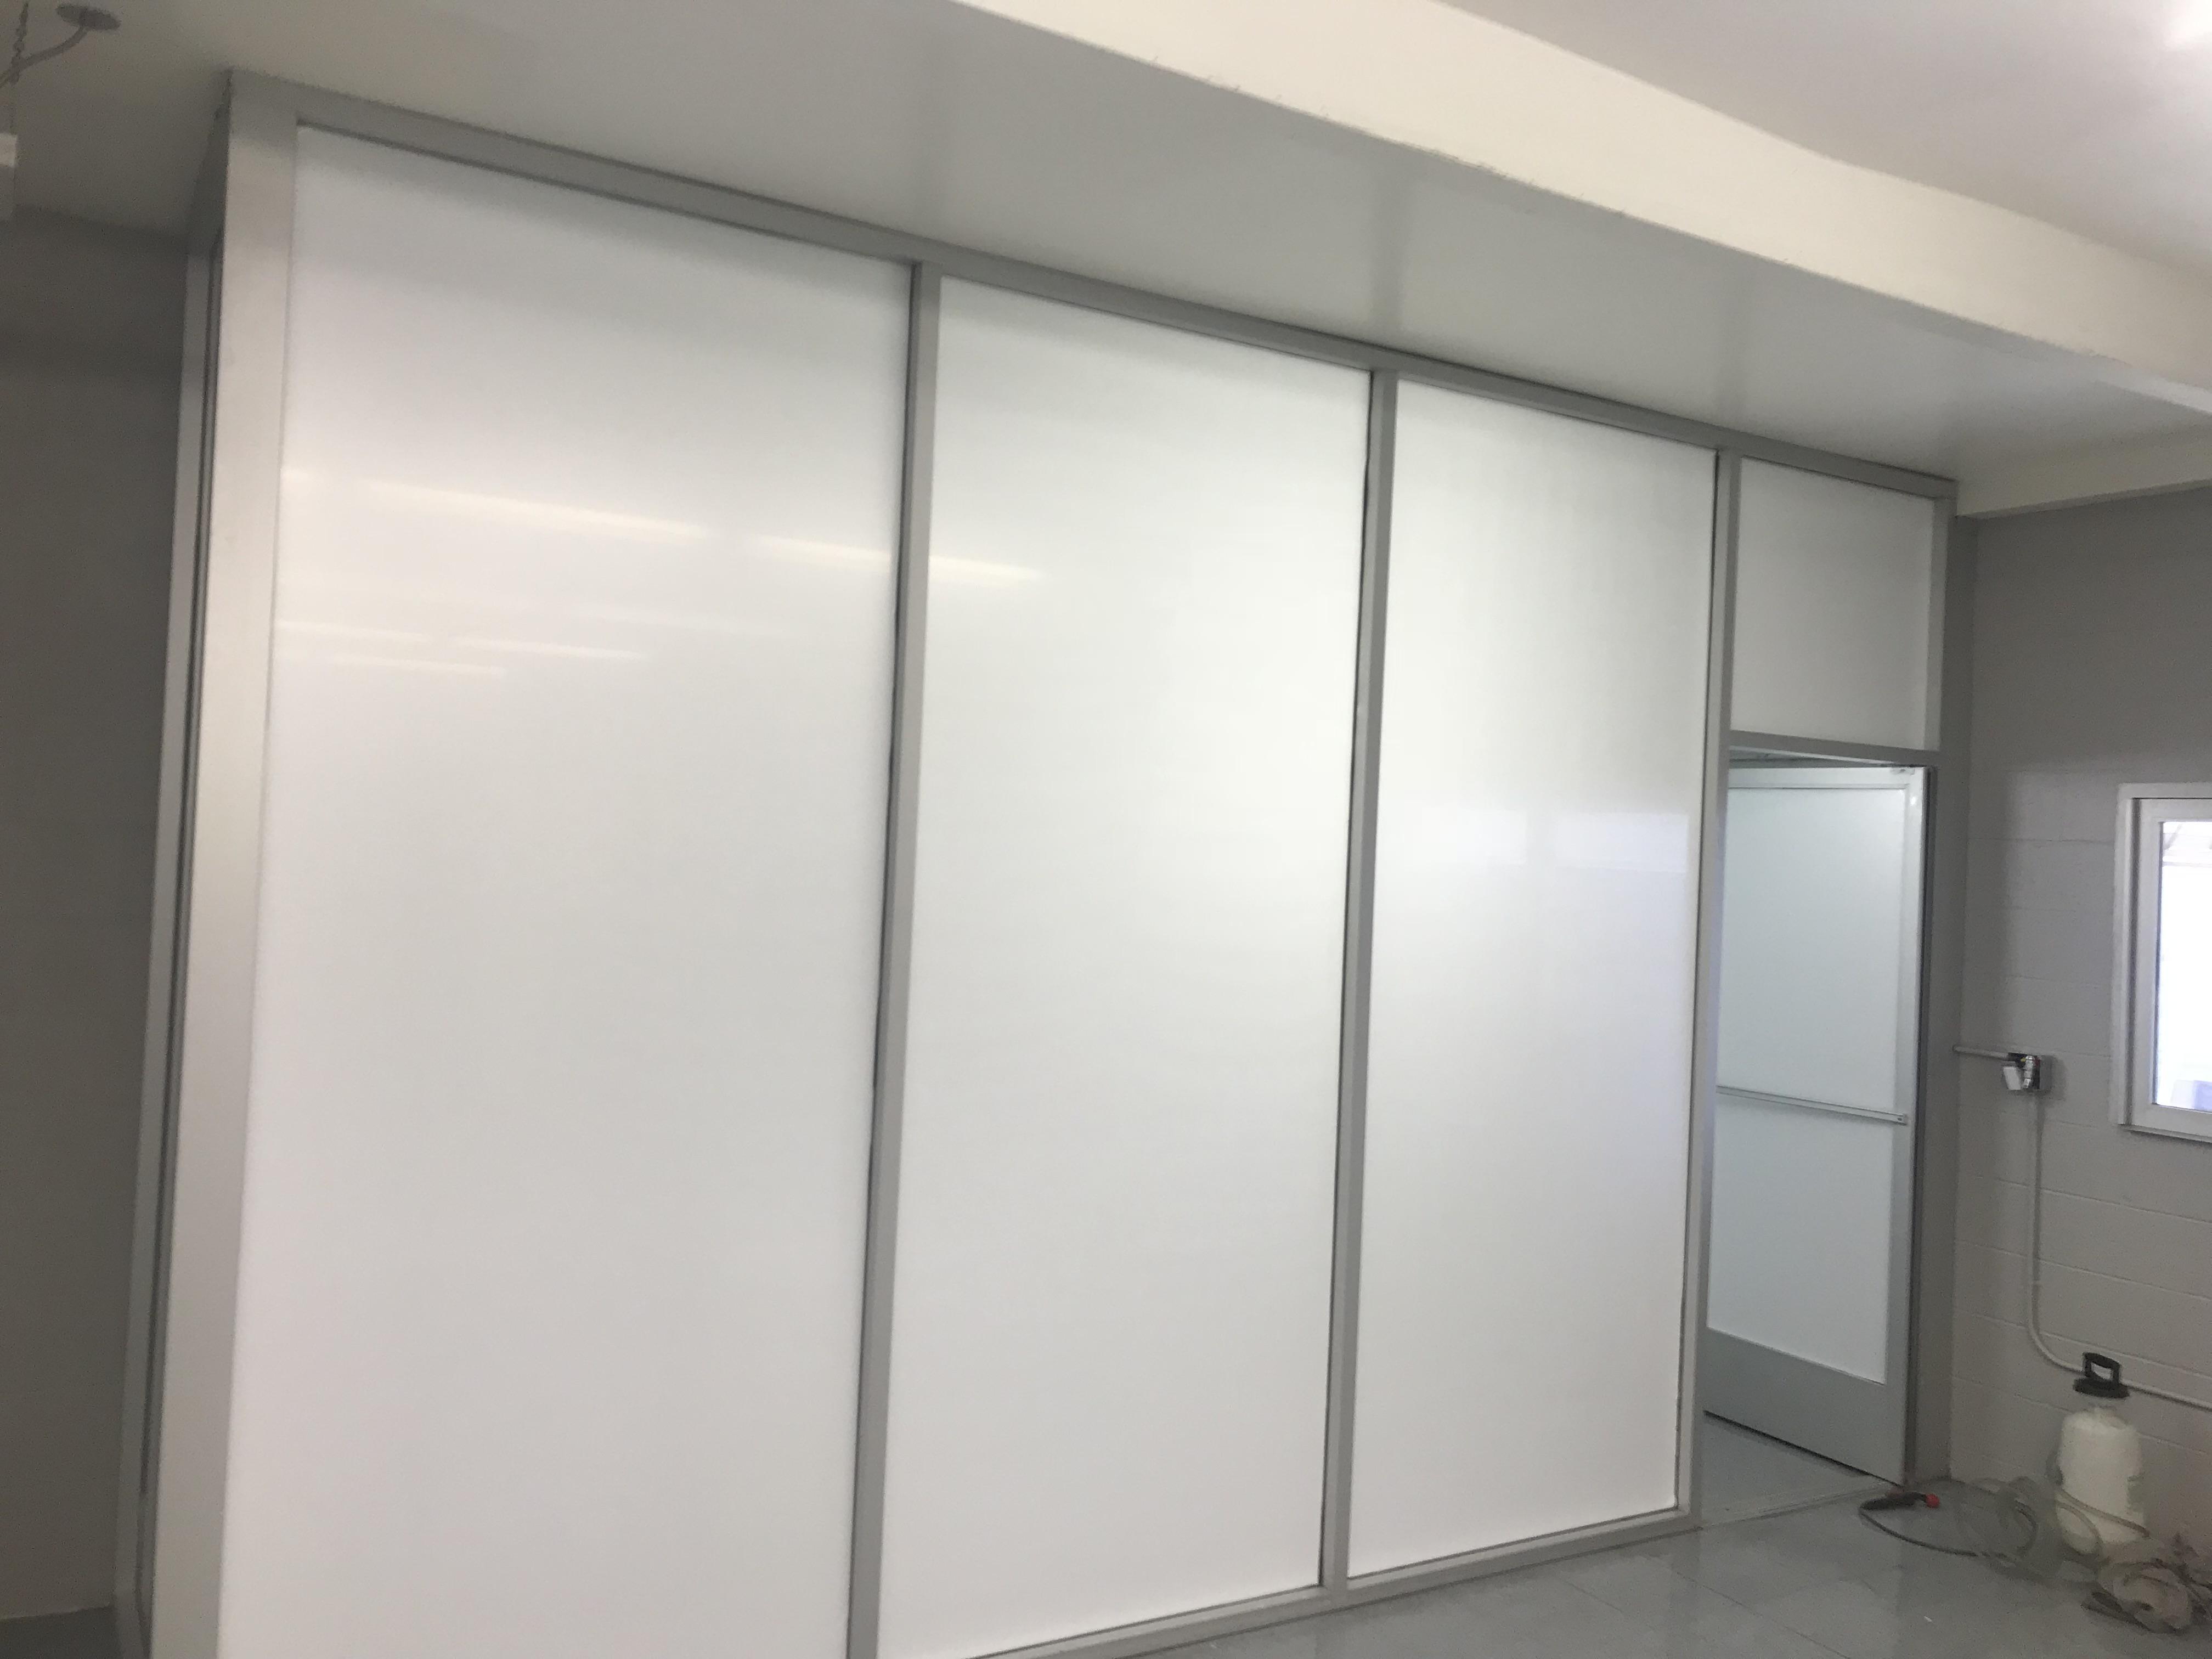 white frost window film, window tint, commercial window tinting, privacy window film, best window tint shop los angeles, 3m window film, crystalline window film, llumar window film